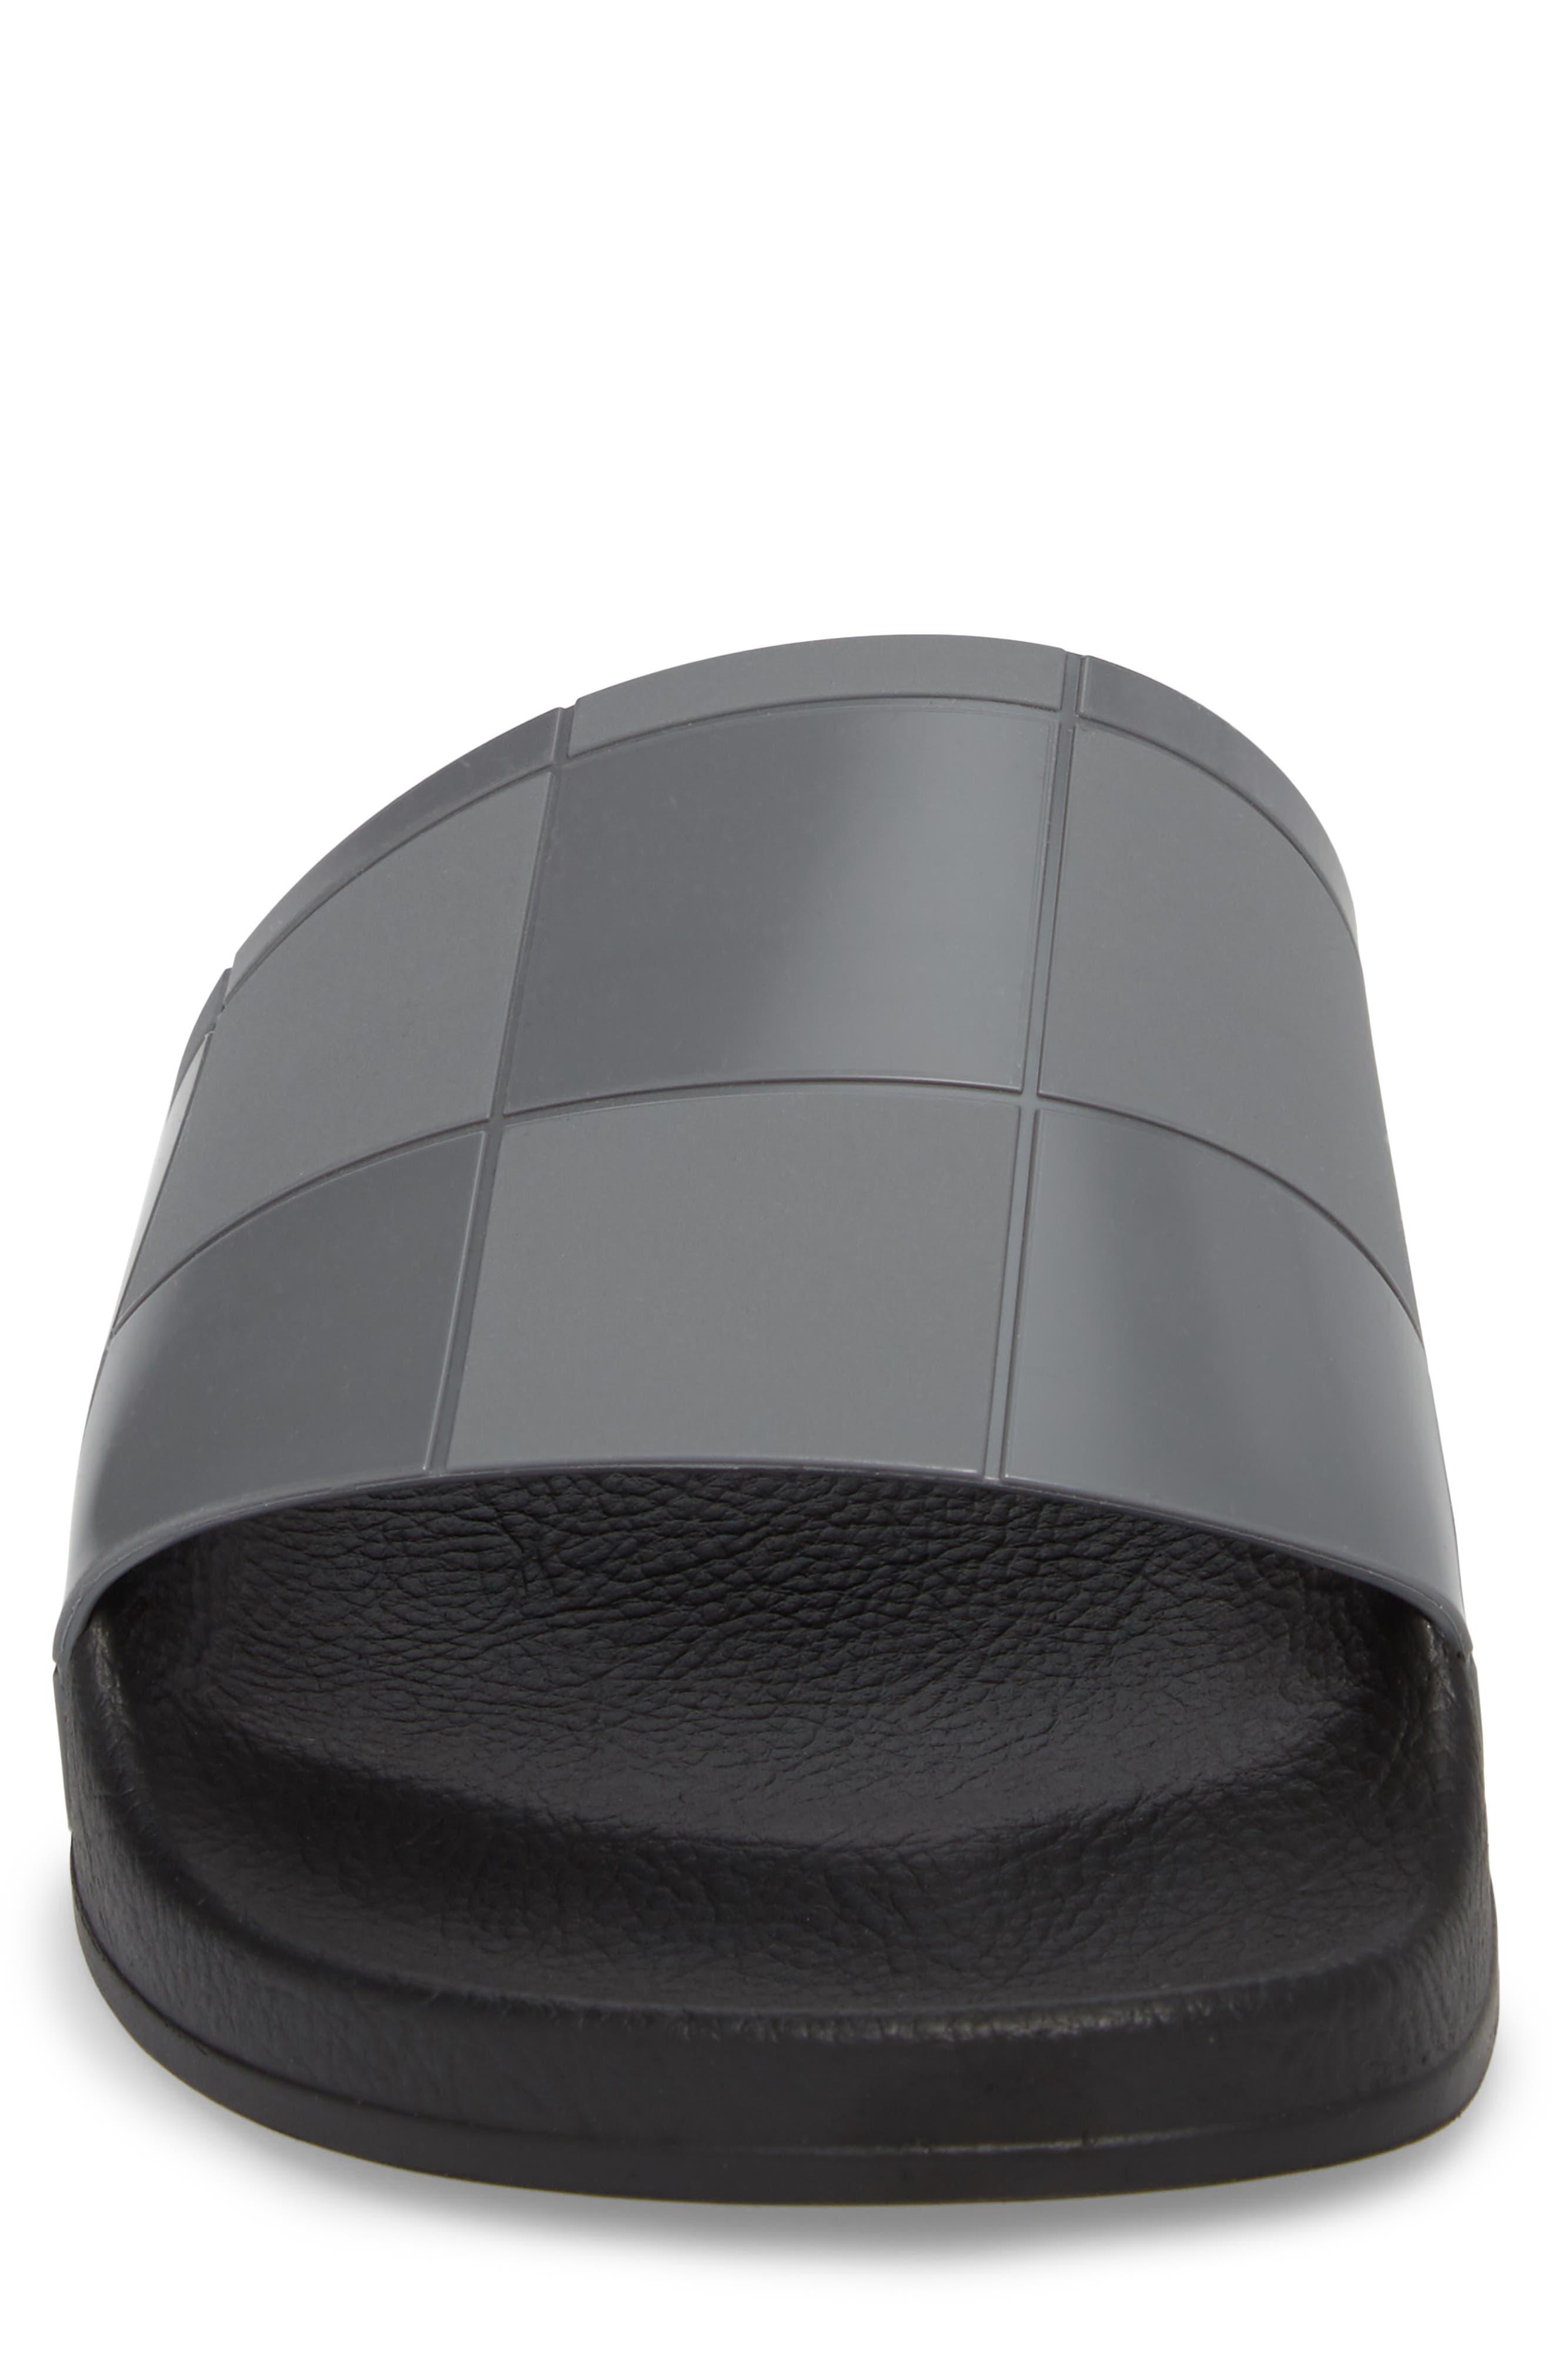 Adilette Checkerboard Sport Slide,                             Alternate thumbnail 4, color,                             Core Black/ Granite